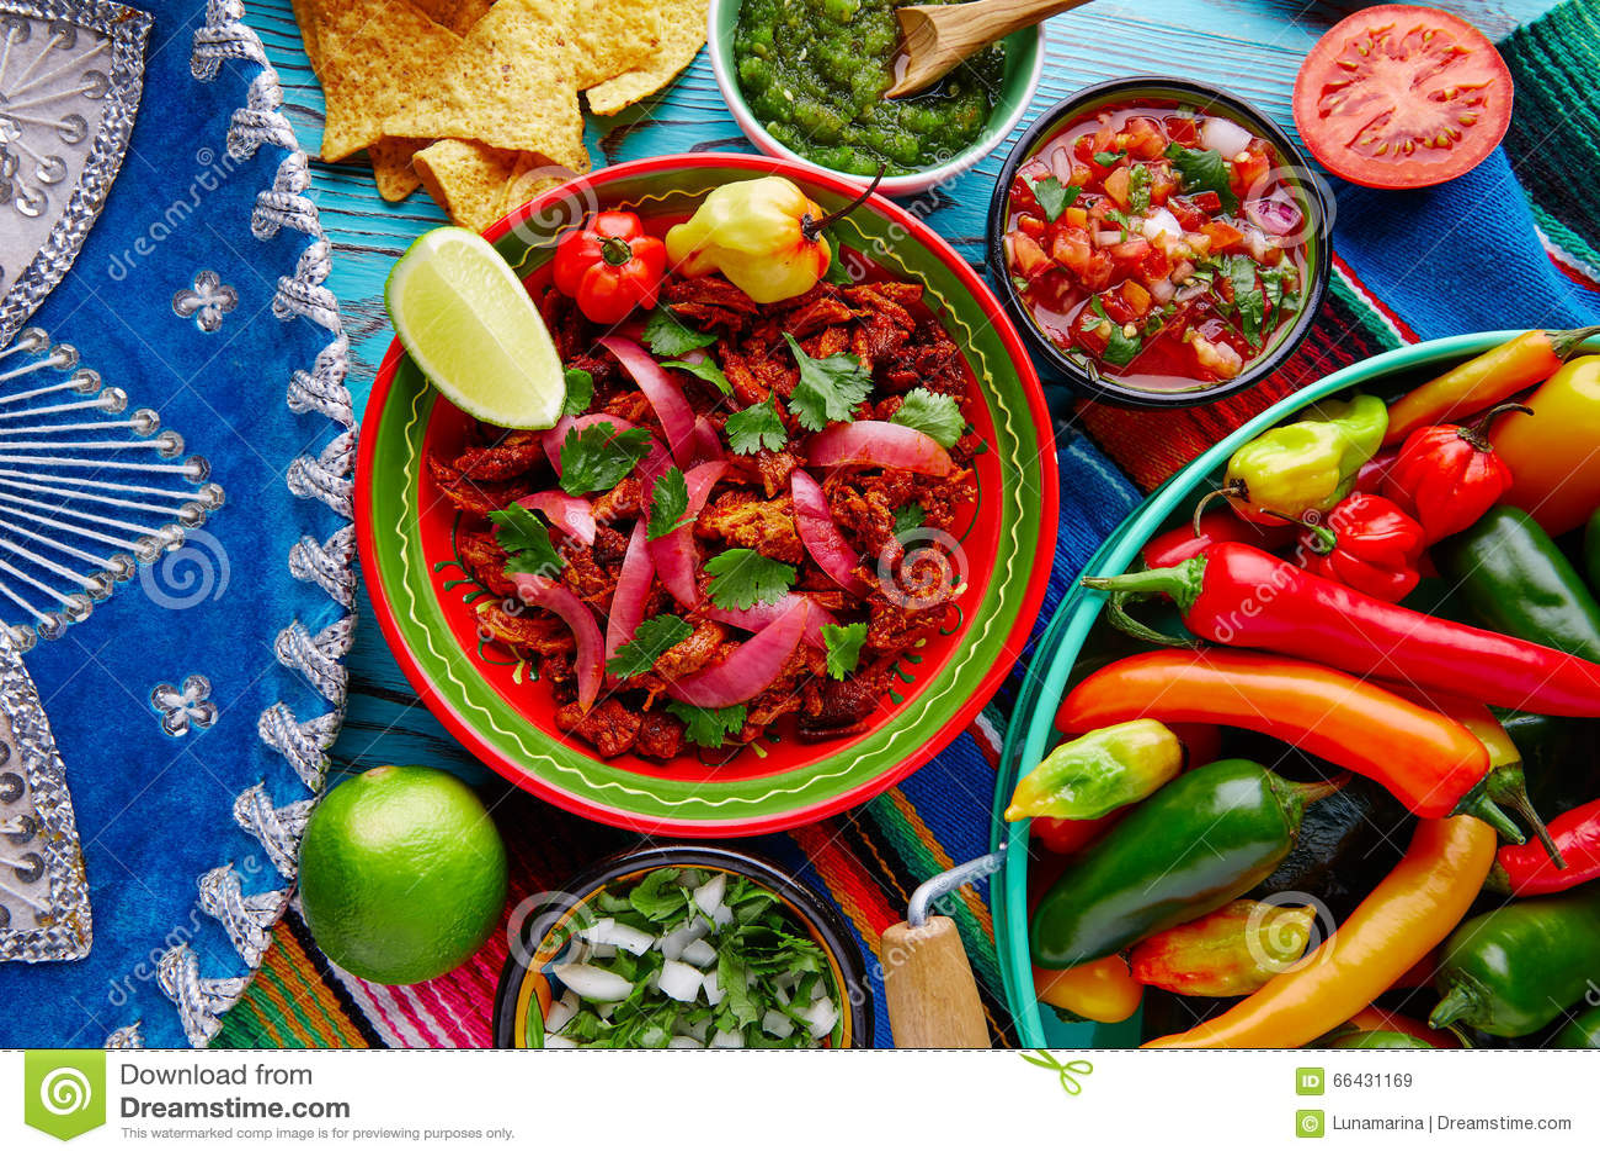 Cochinita Pibil墨西哥食物用红洋葱